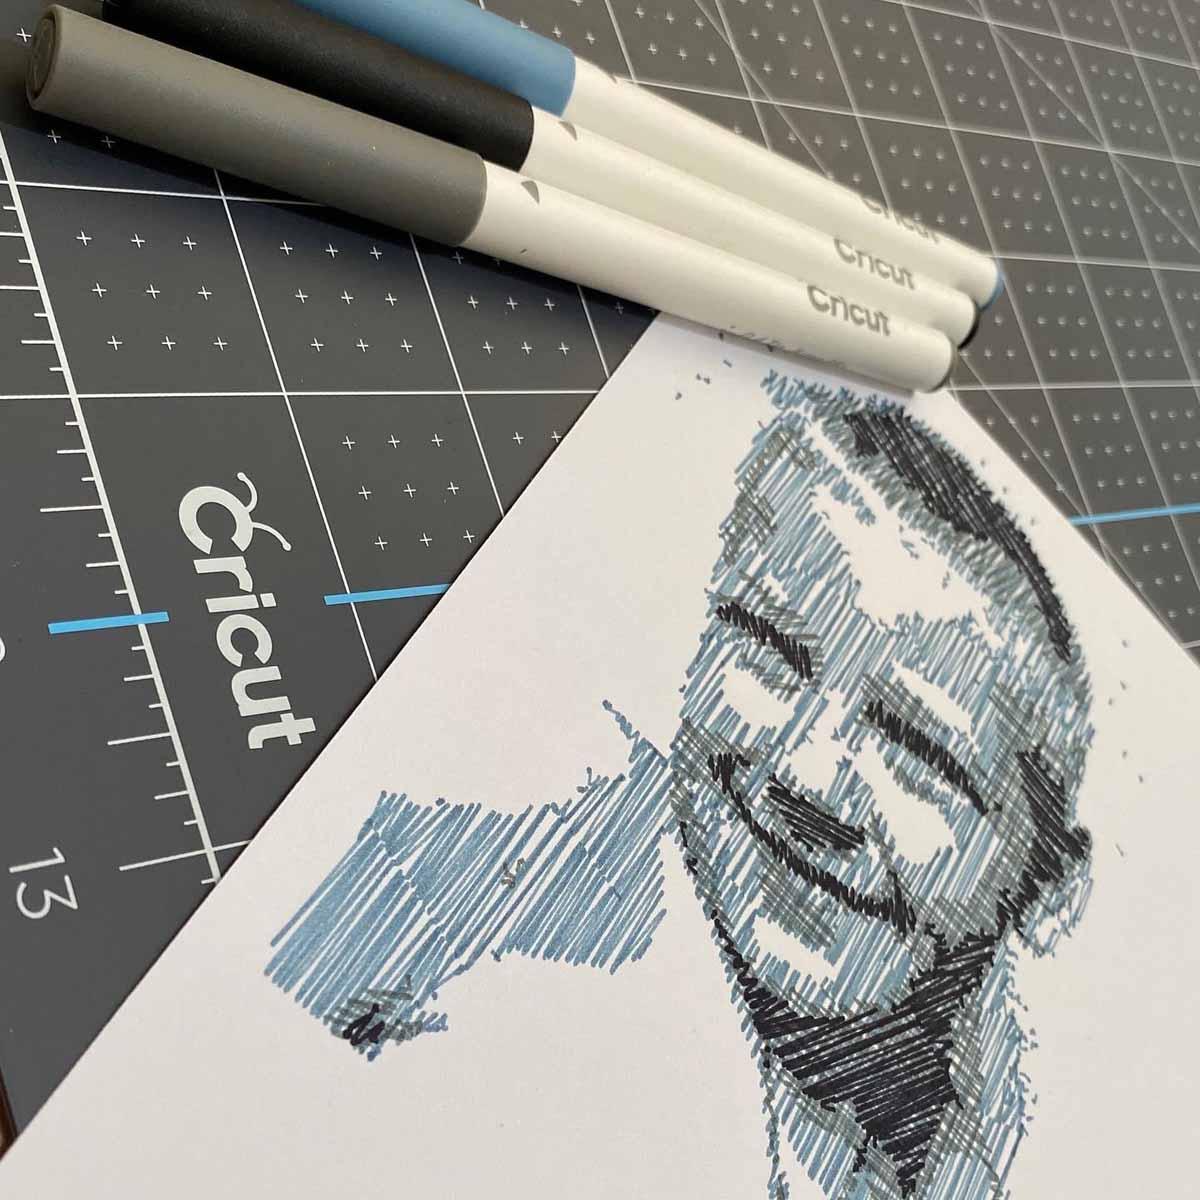 Tamara Tigchelaar - sketching with Cricut pens